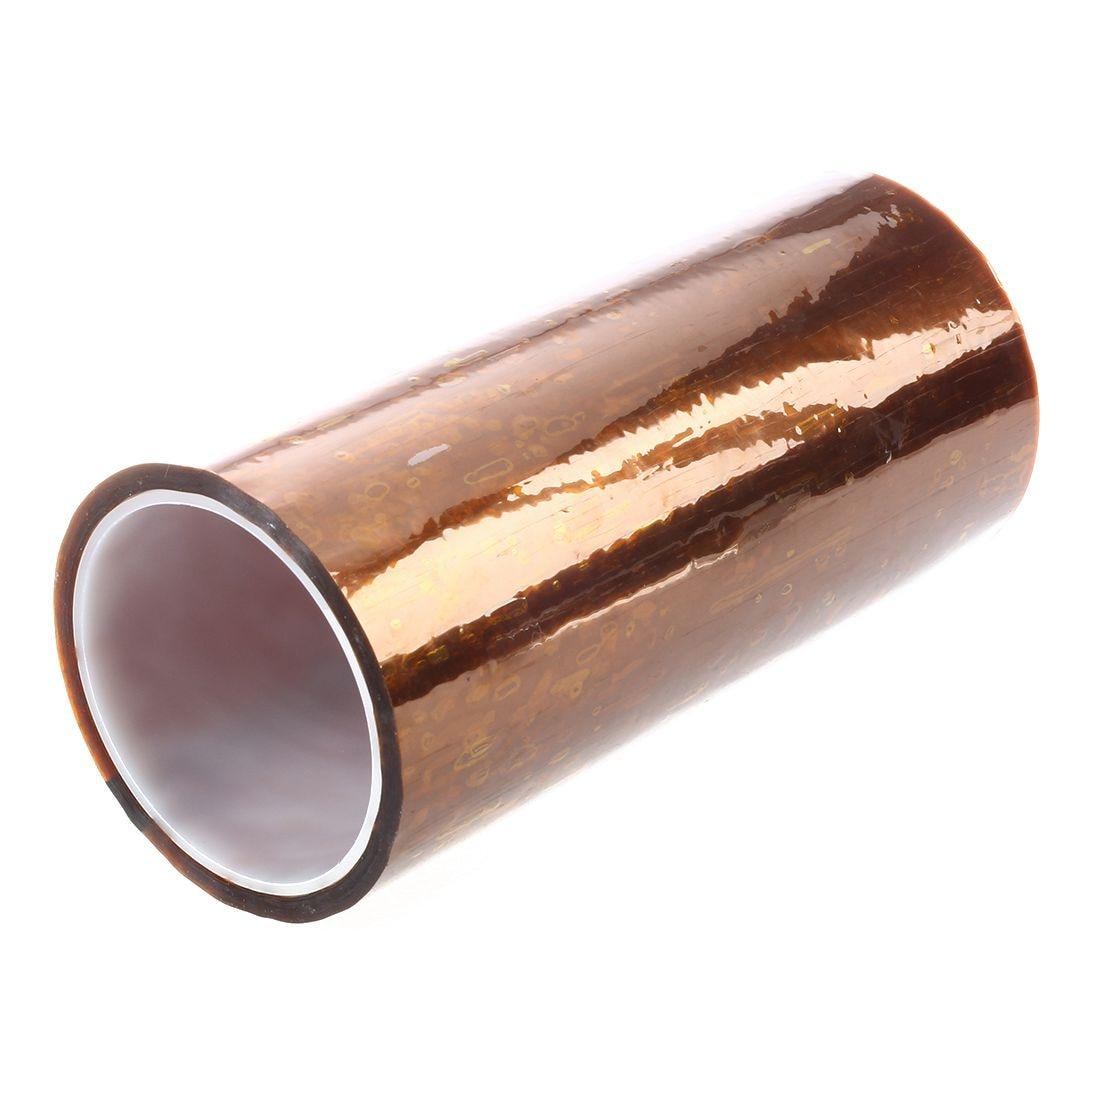 10pcs //Lot 10mm x 33m High Temperature Heat Resistant Kapton Tape 100ft